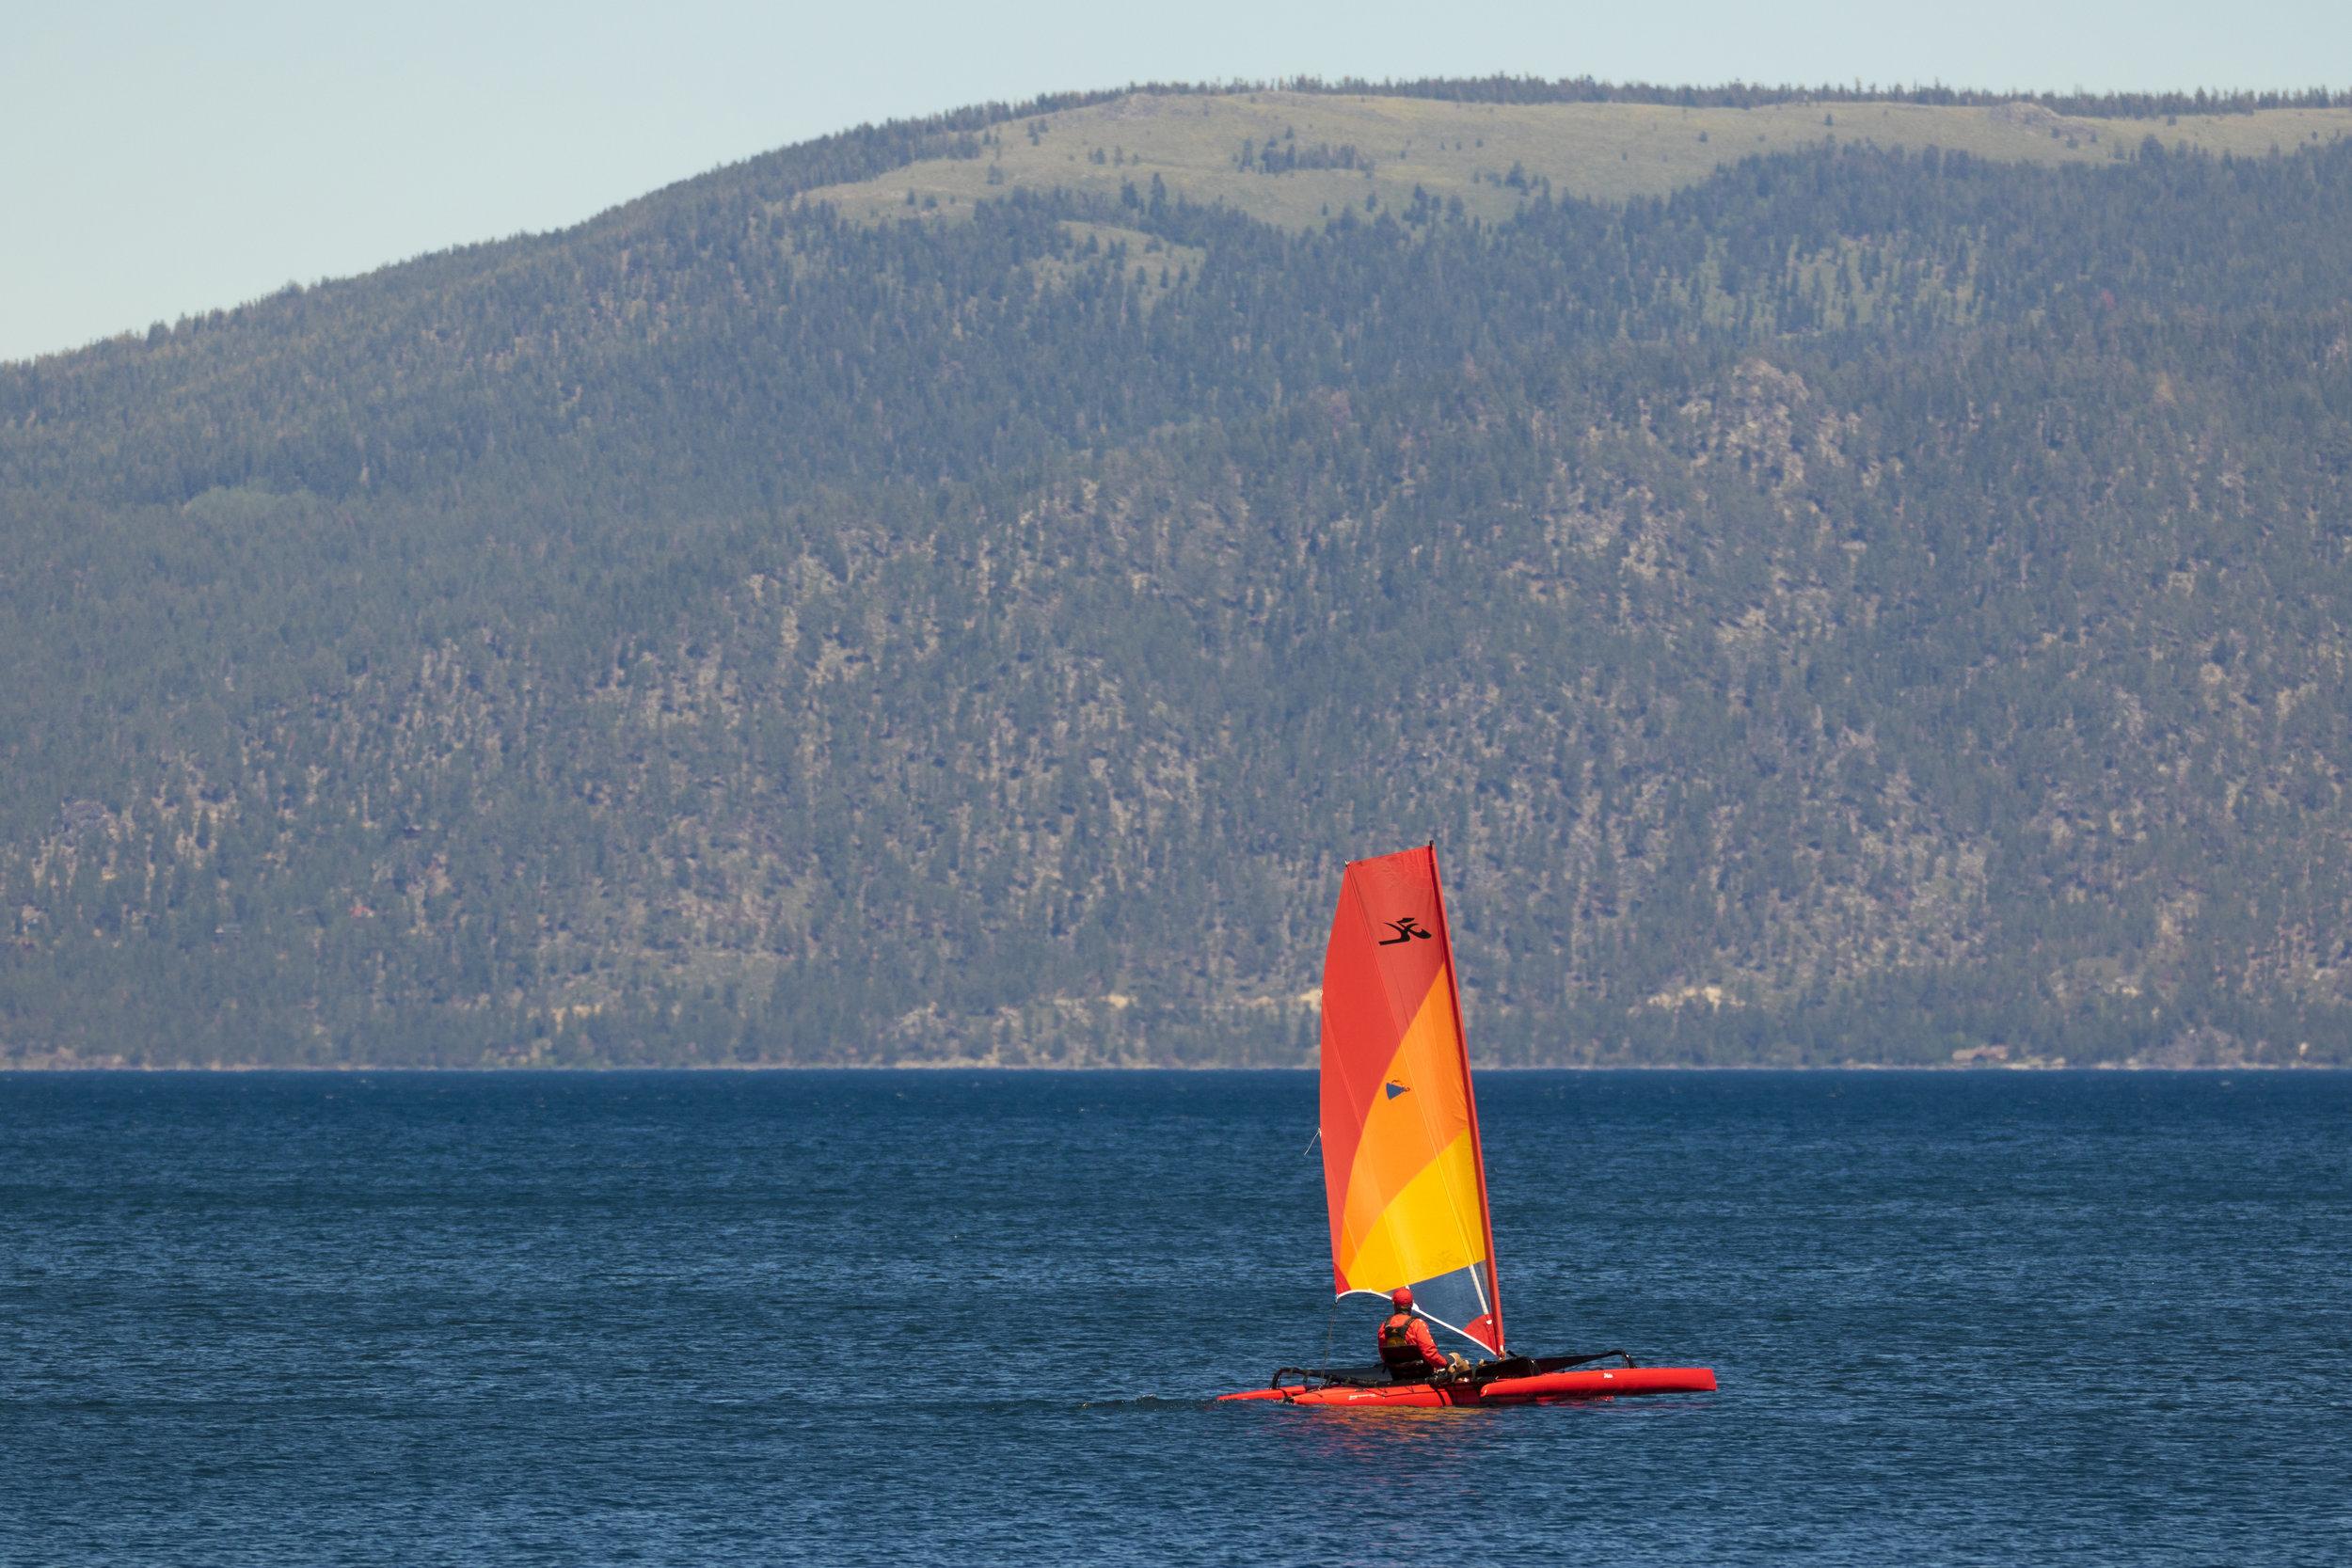 AdventureIsland_action_Tahoe_Red_biglake_2029_full.jpg